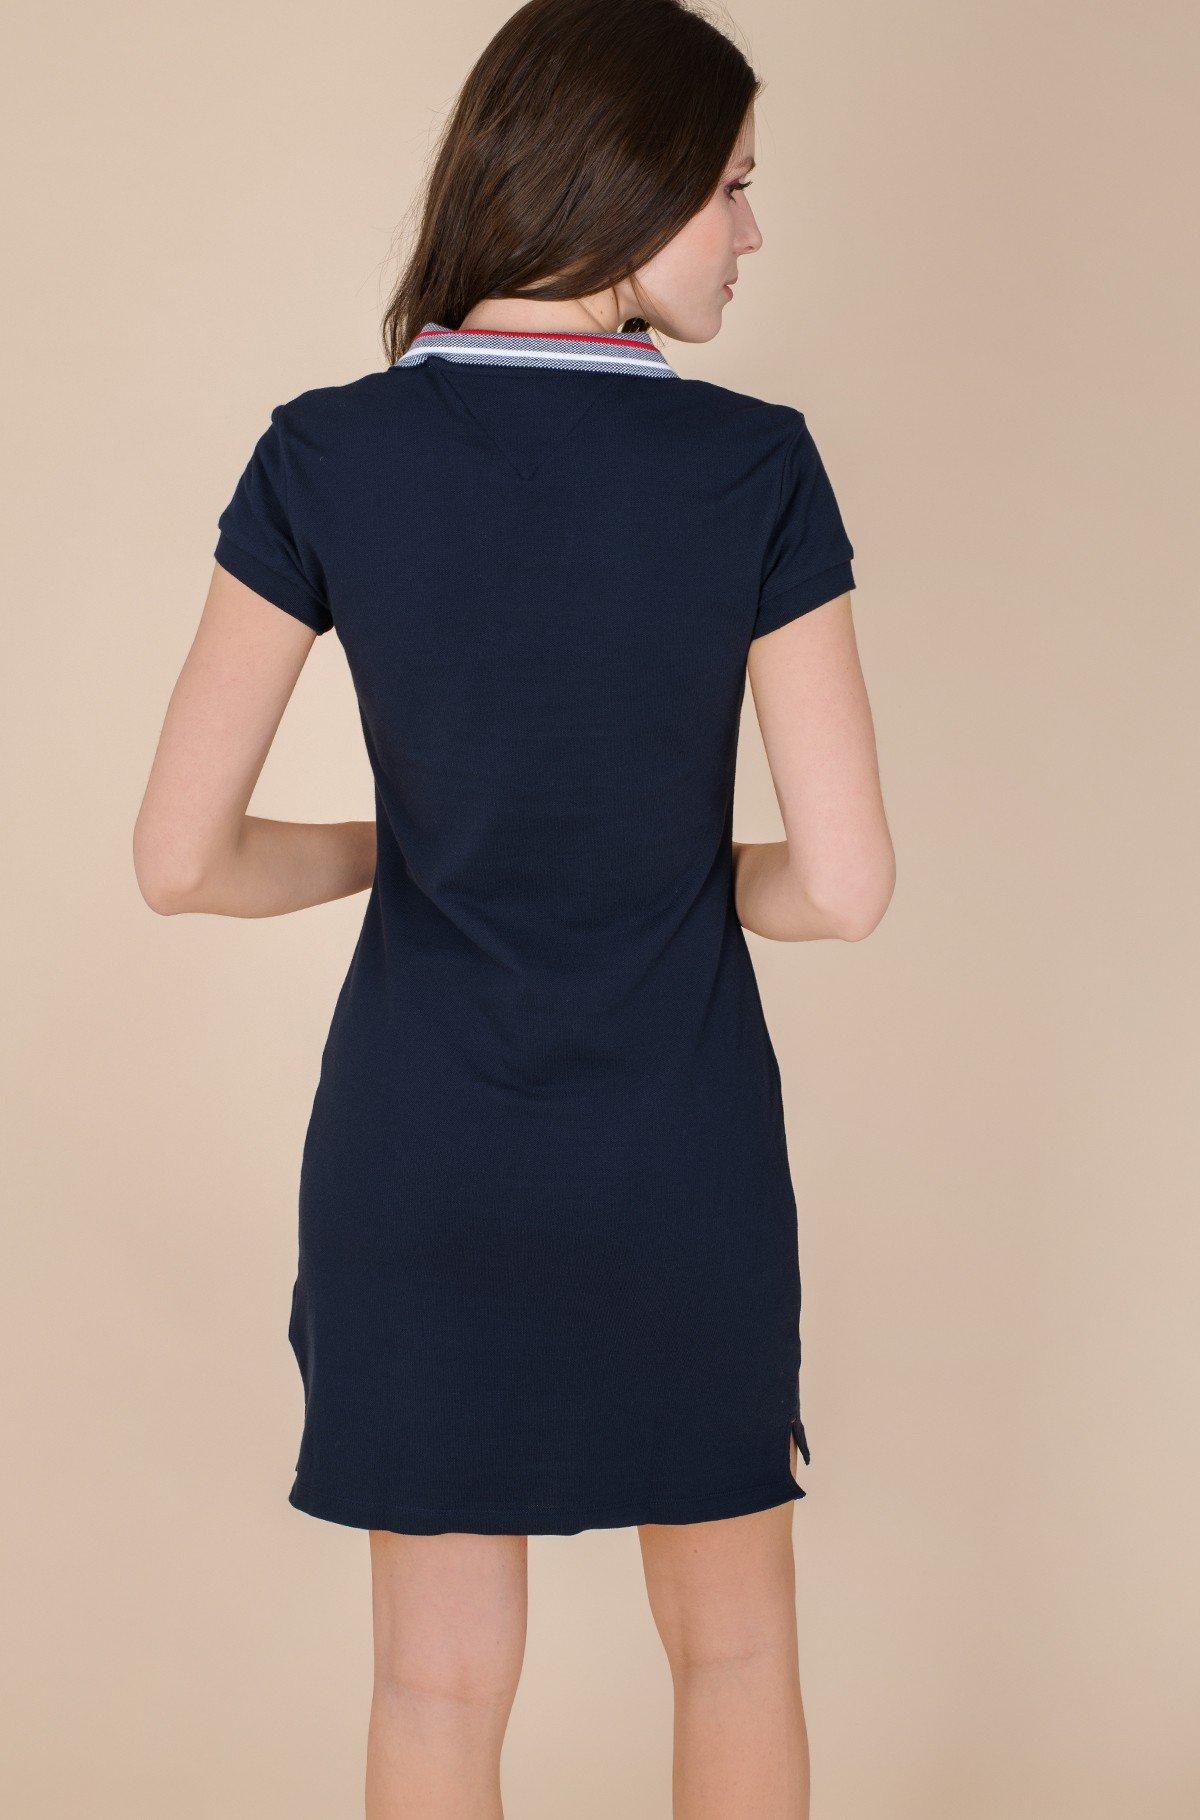 Polodress TIPPING SLIM POLO SHORT DRESS SS-full-2